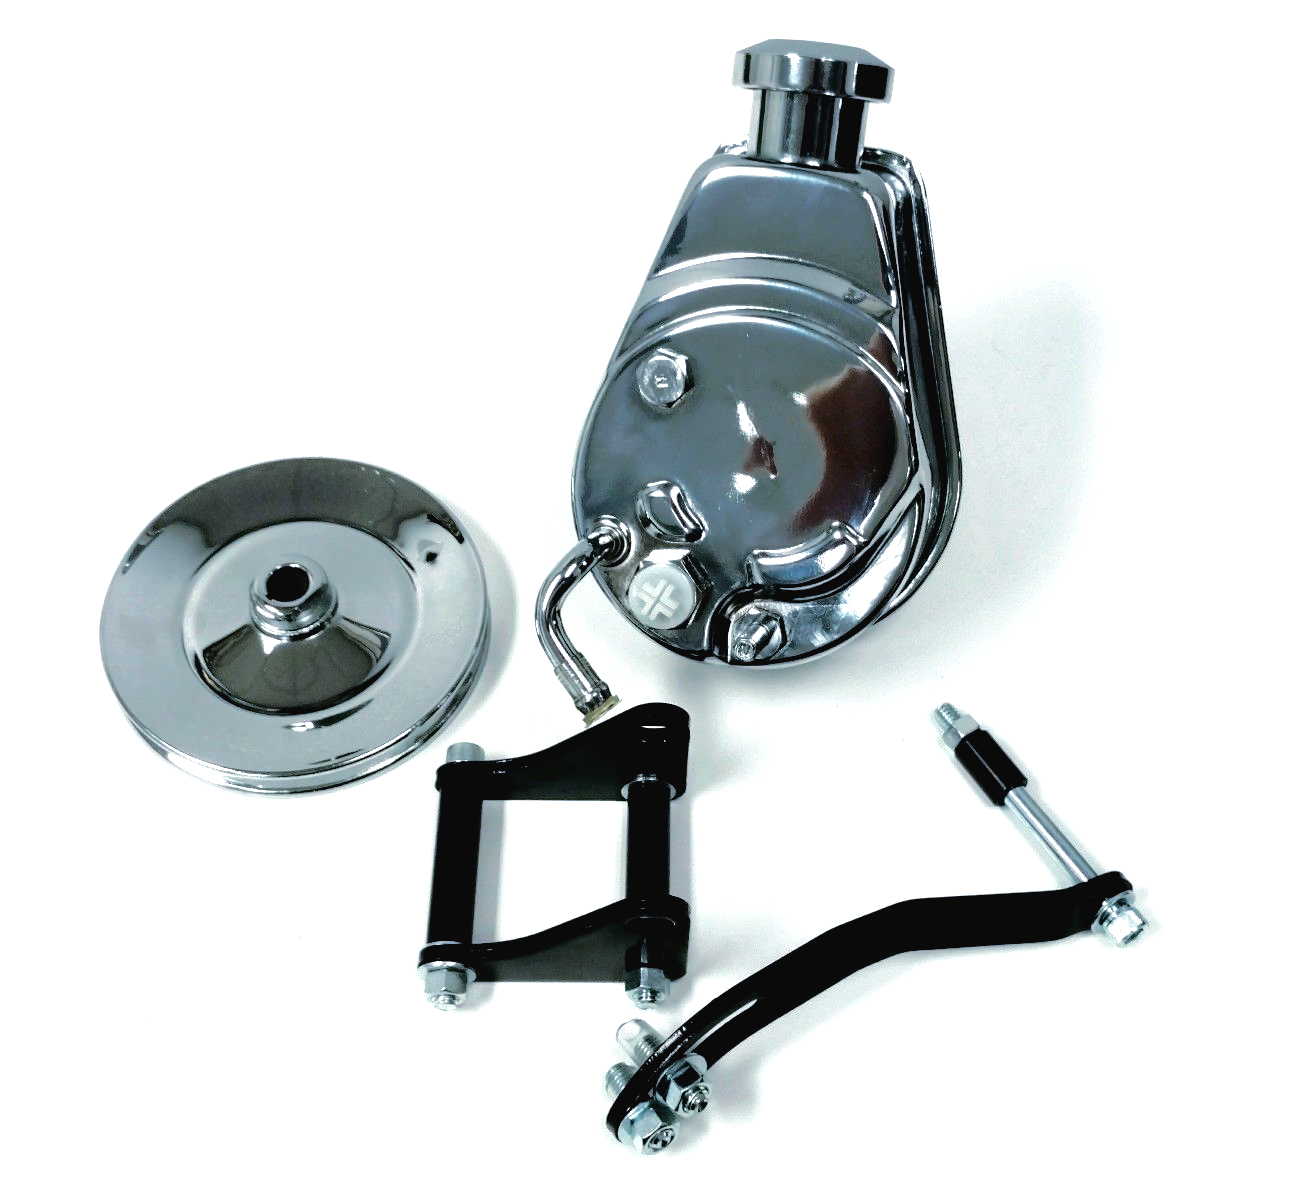 Saginaw Power Steering Pump >> Details About Sbc Chevy Chrome Saginaw Style Power Steering Pump W Pulley Black Bracket